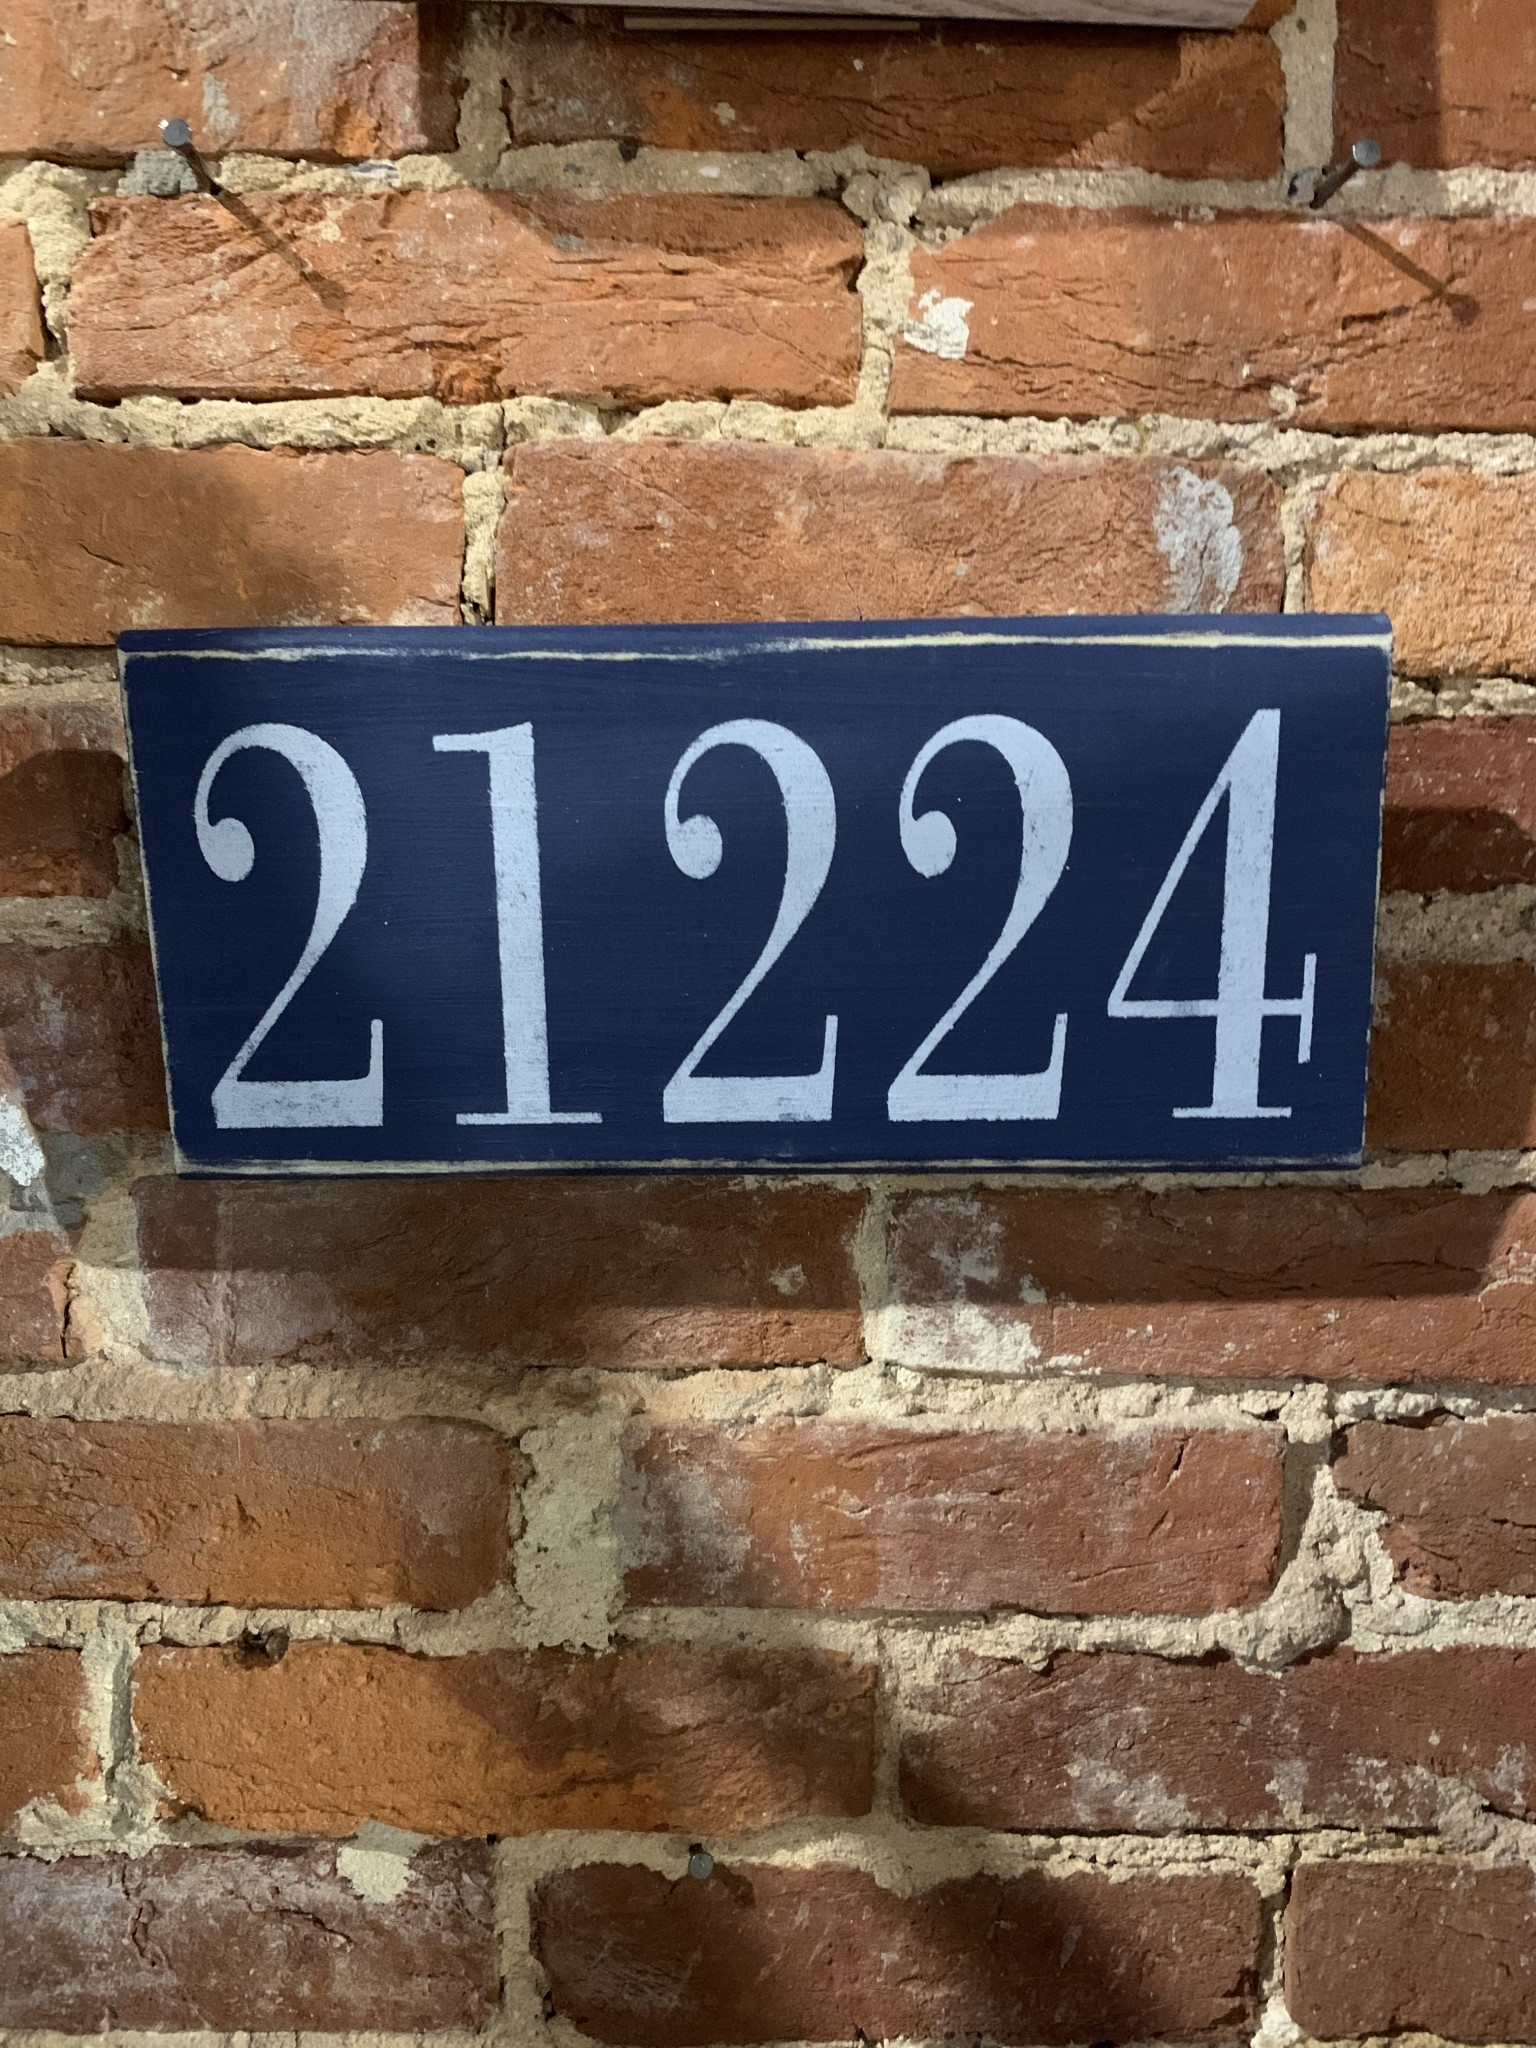 The Painted Mermaid 21224 Zip Code Sign - Navy/White